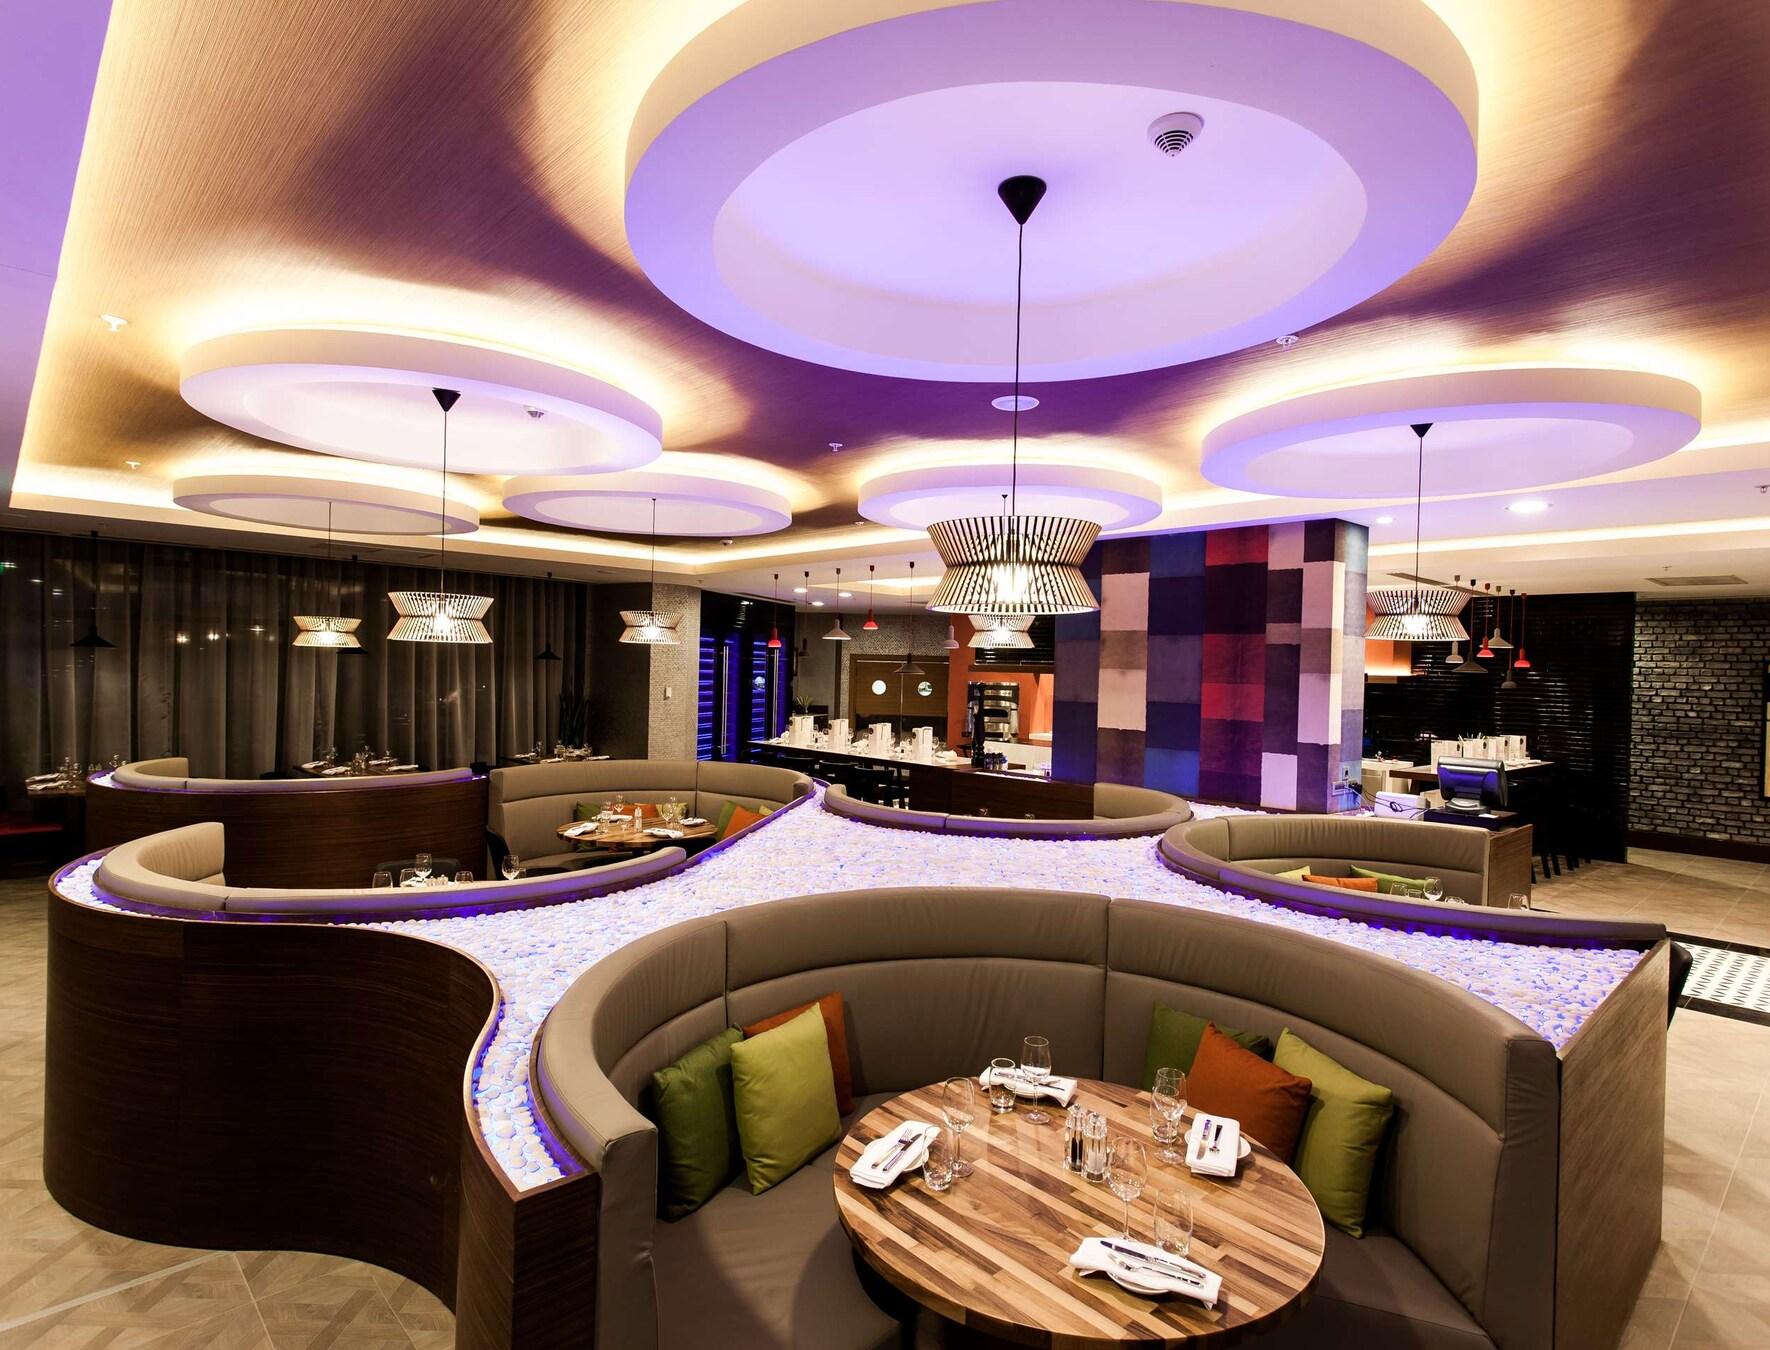 Ресторан Flini ночью